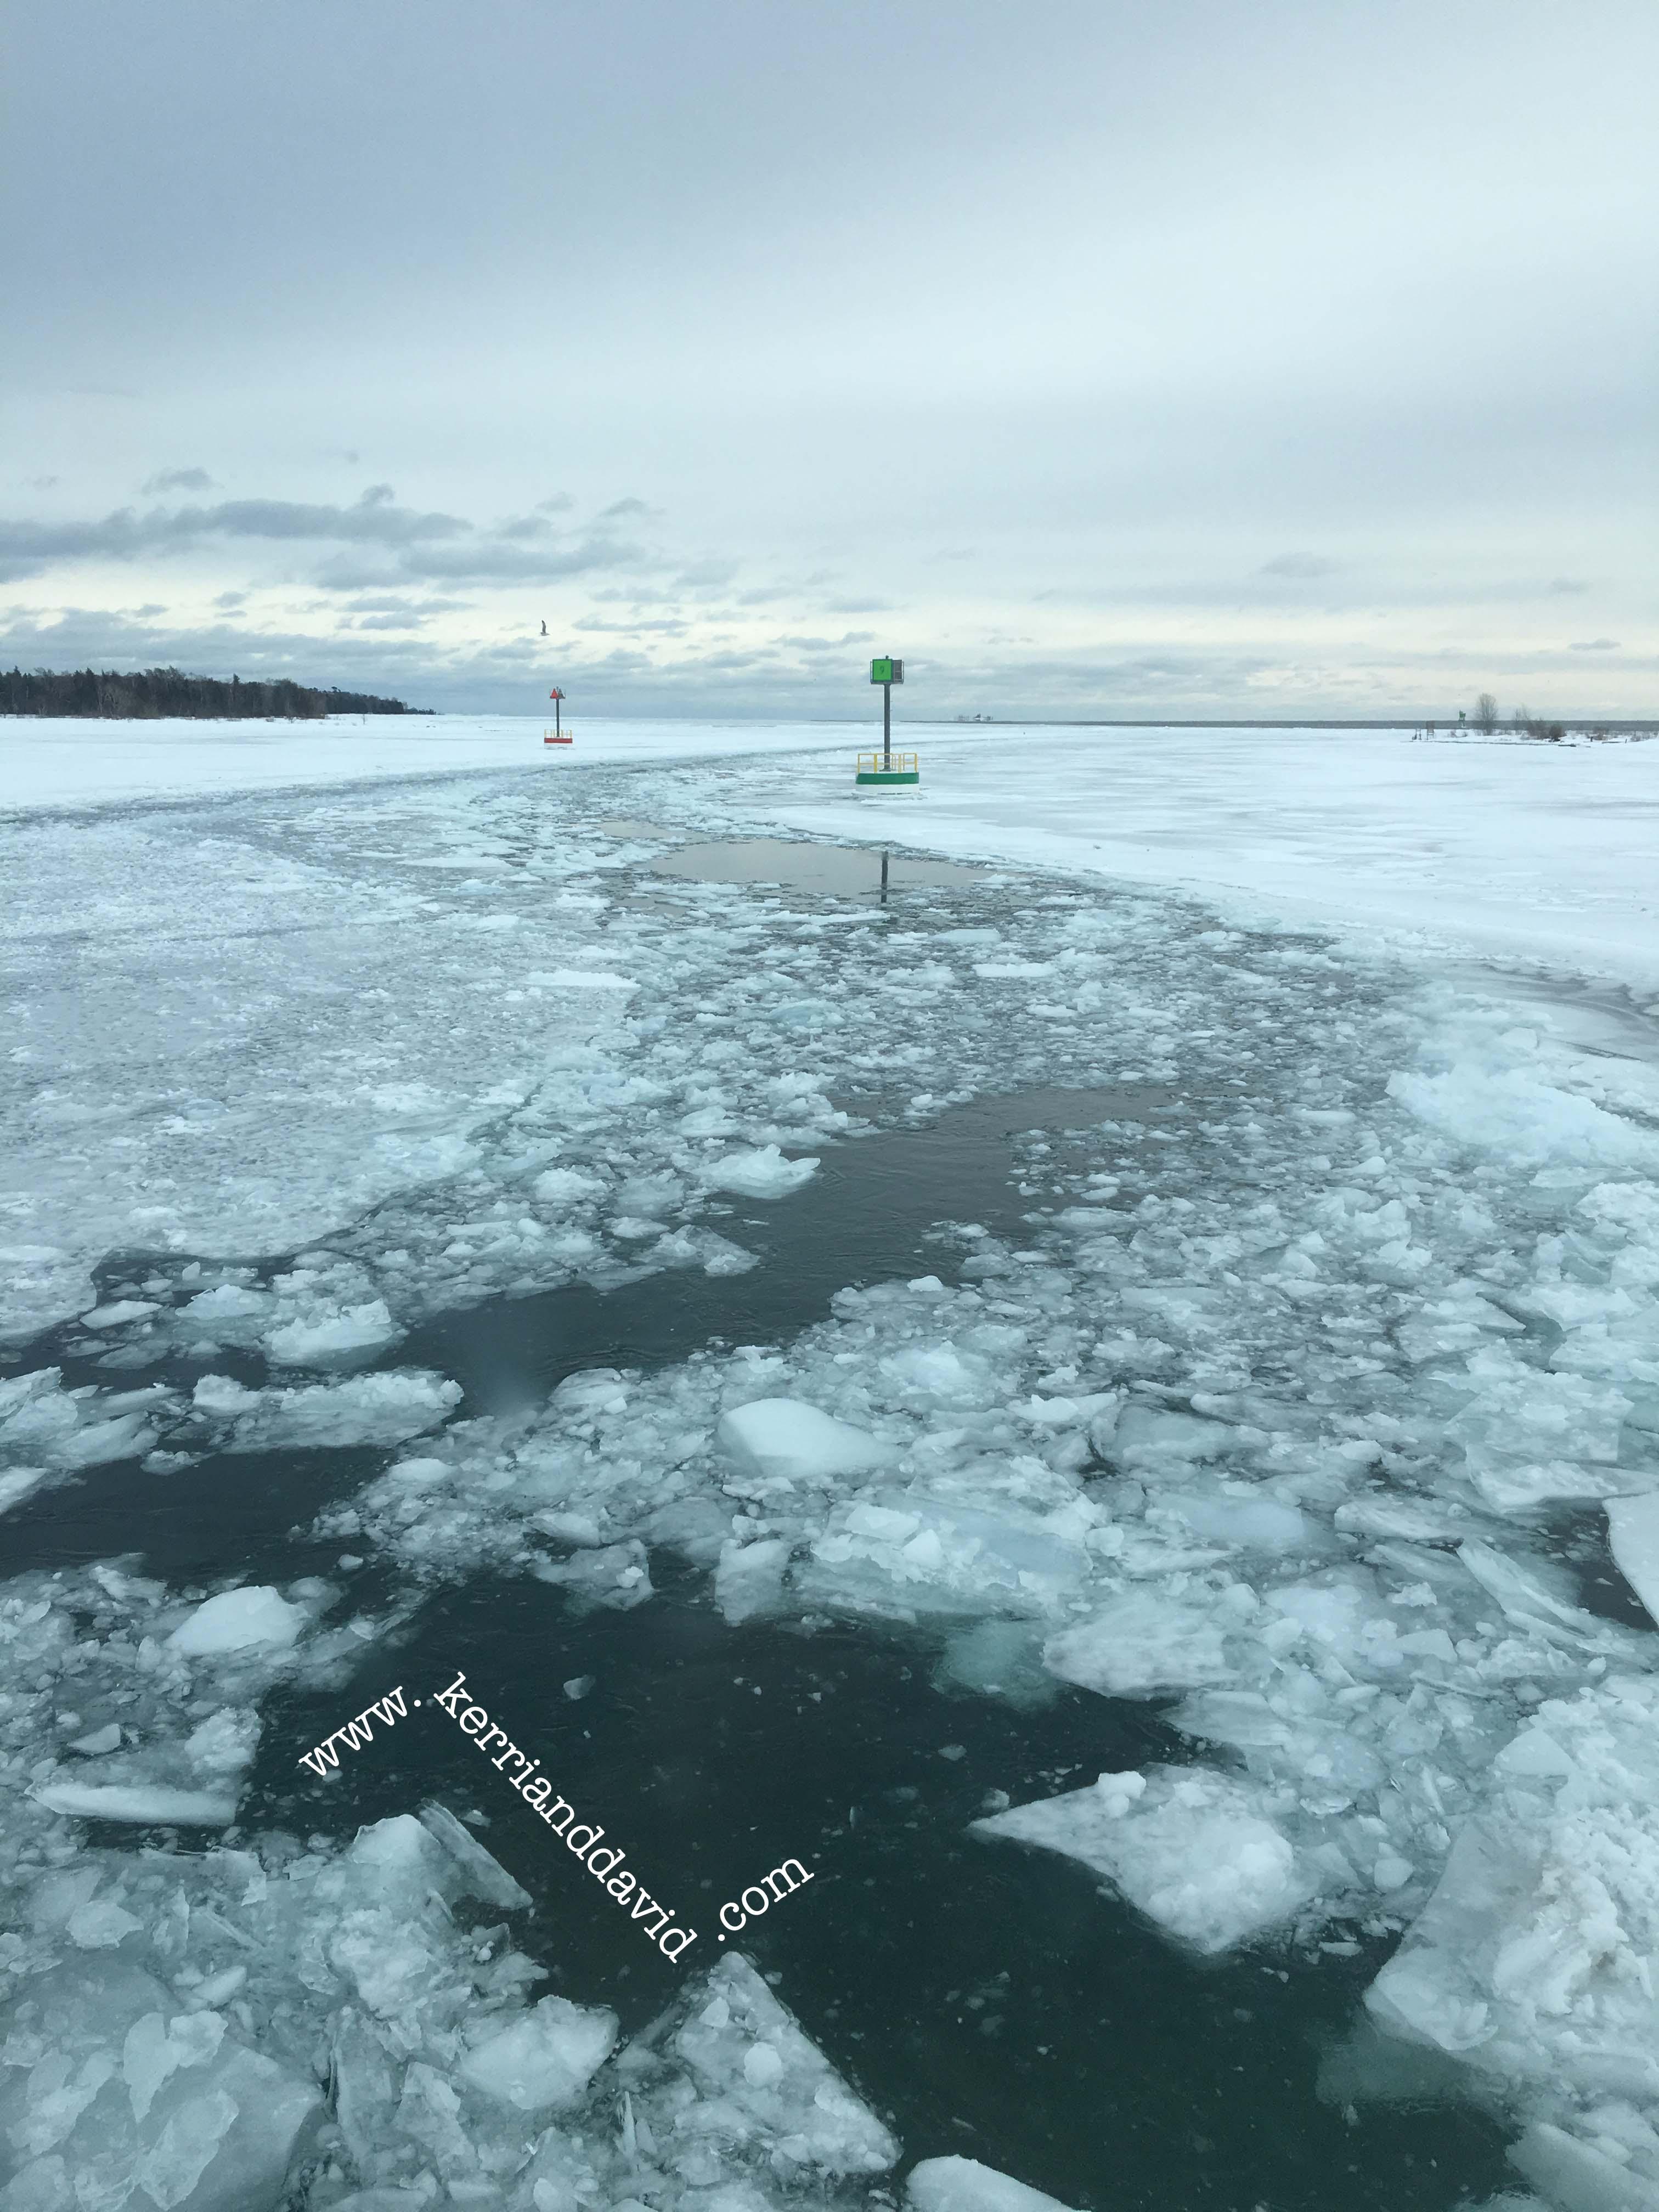 zigzag through ice website box